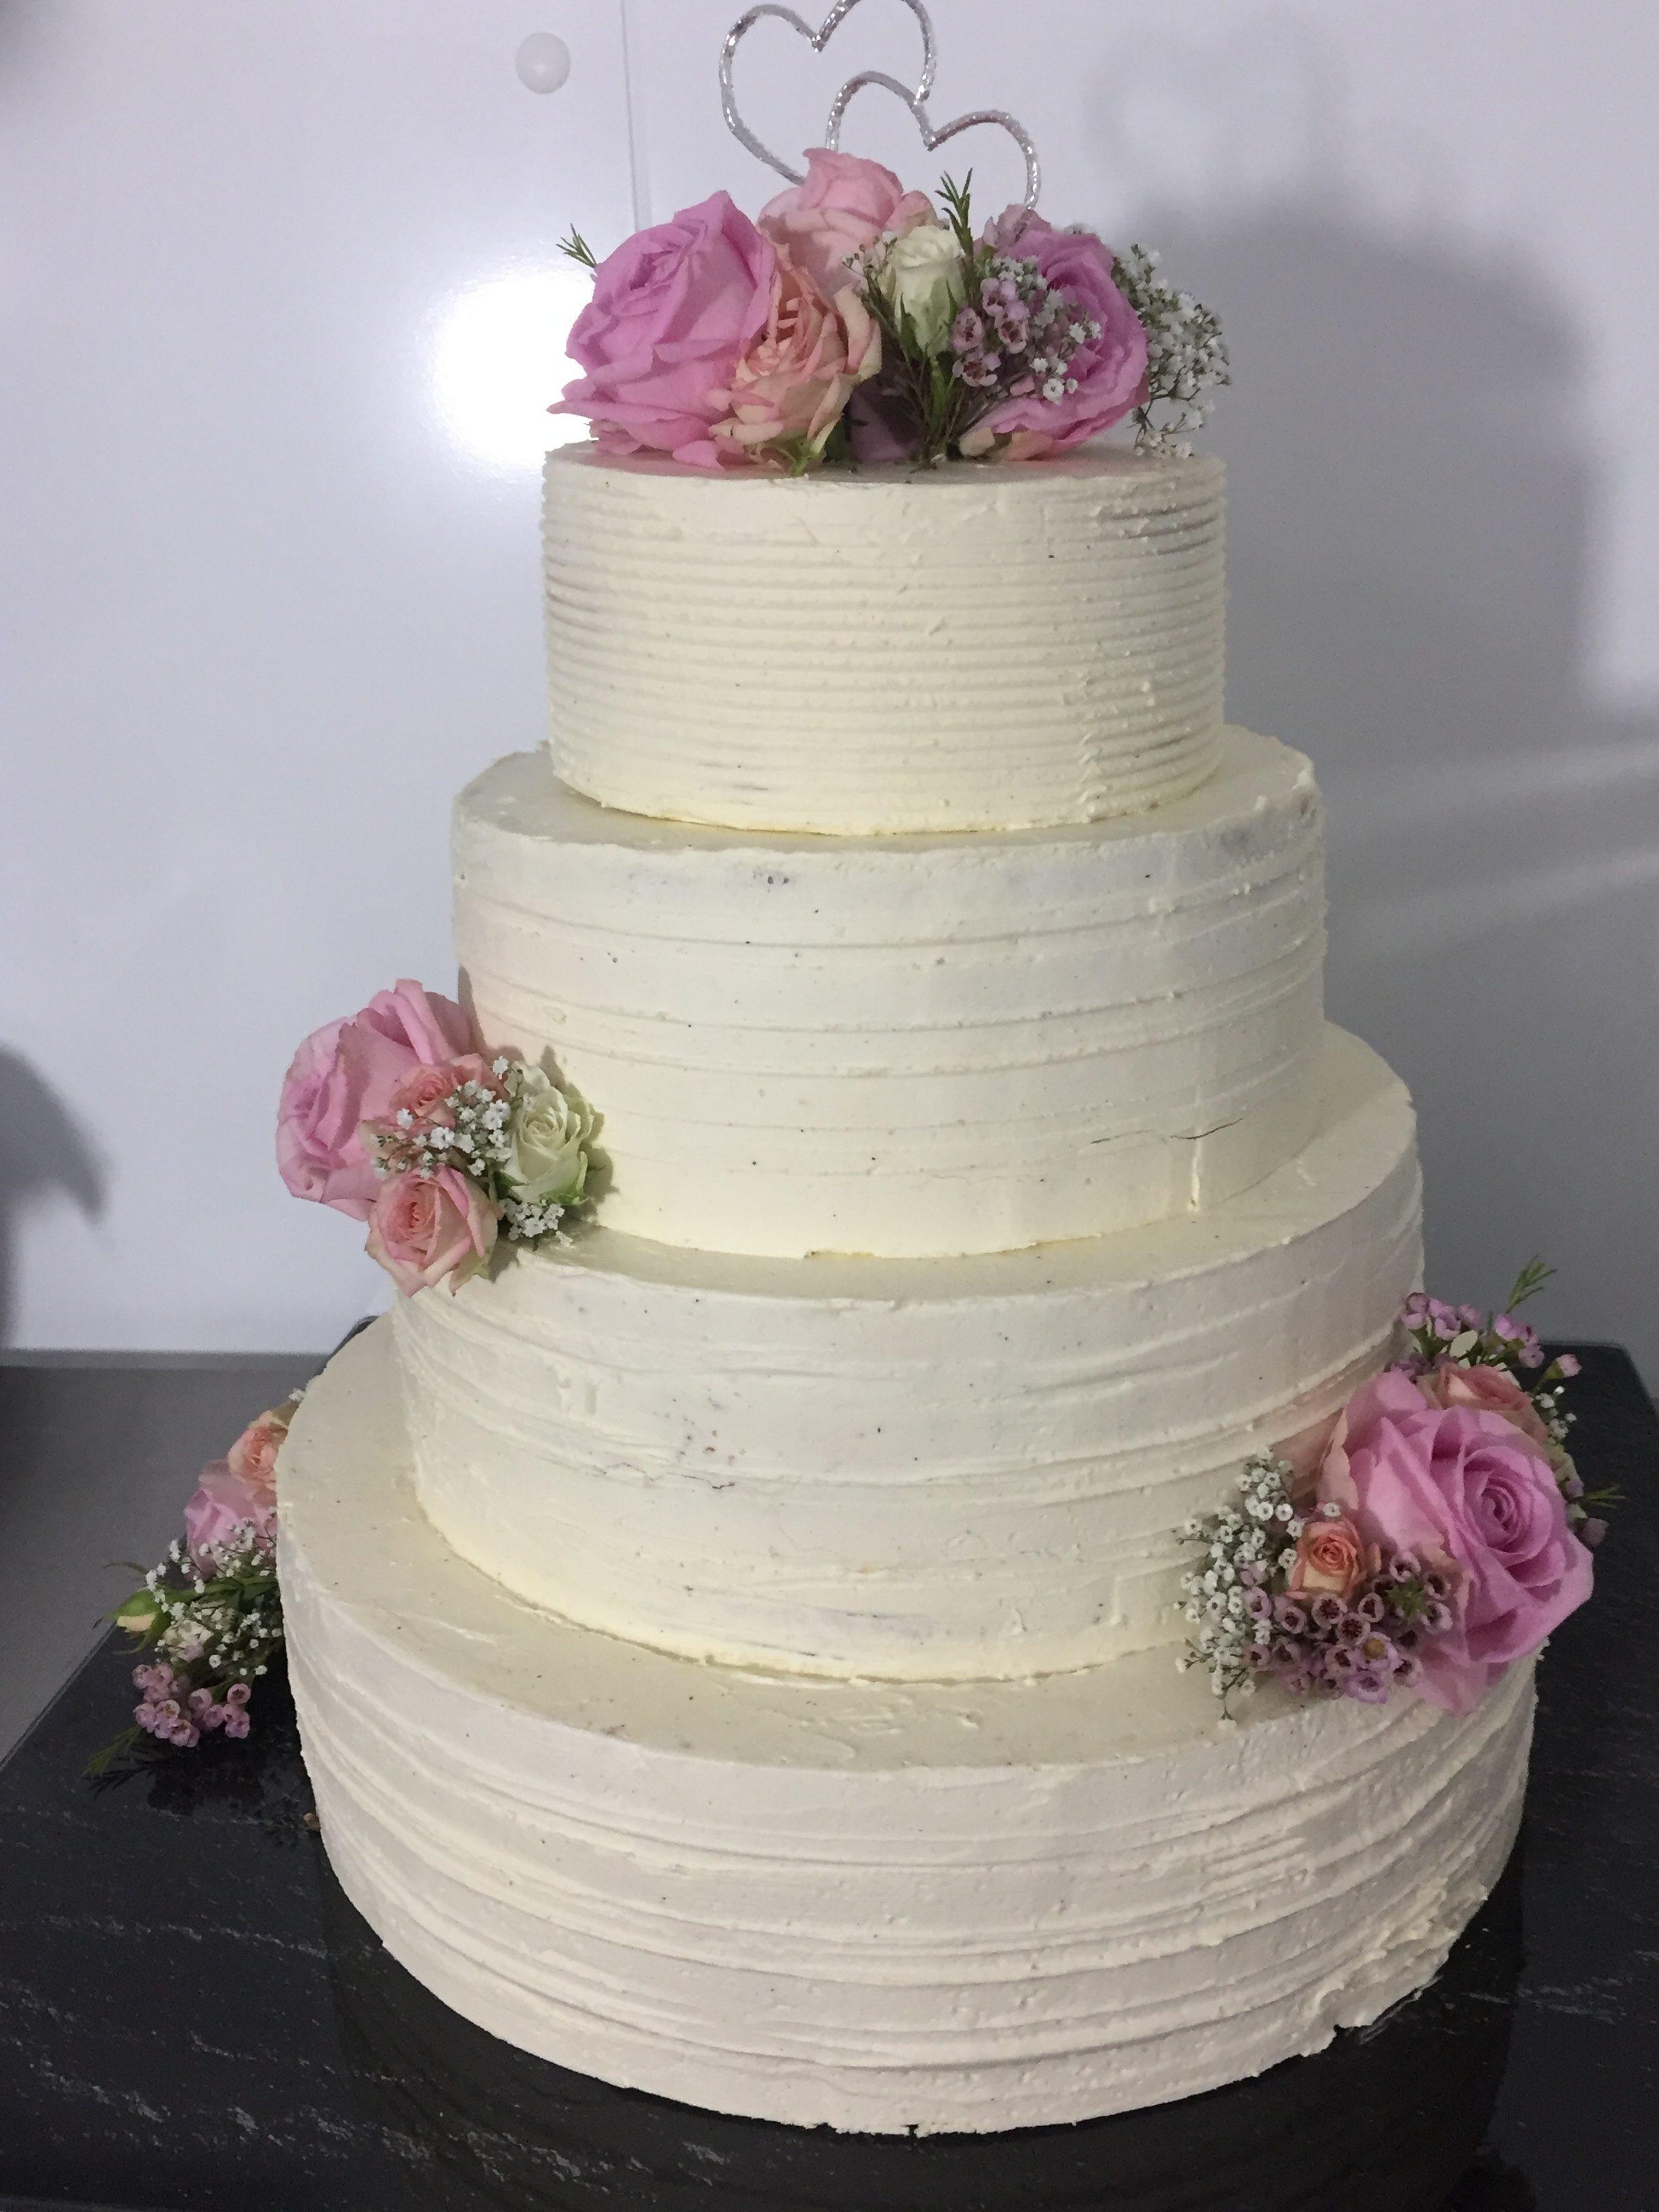 Hochzeitstorte Klein  Hochzeitstorte Klein Geburtstagstorte